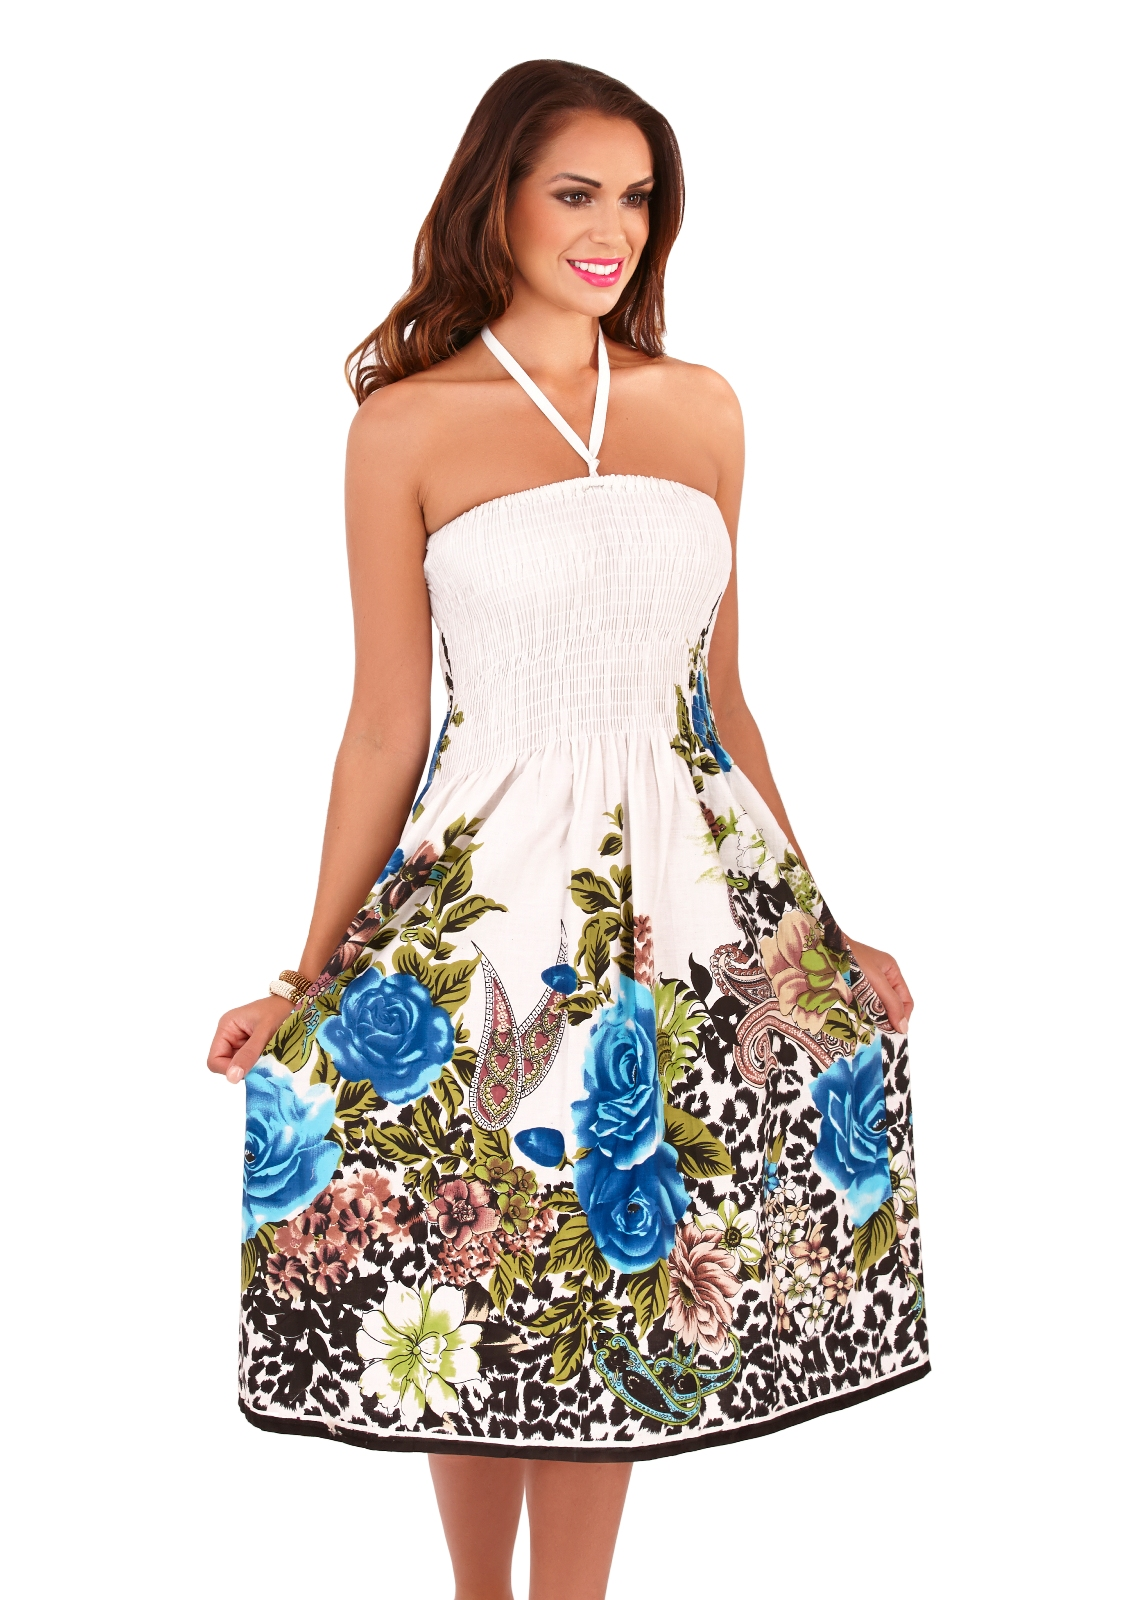 e39924d09094 Womens 3 In 1 Strapless / Halterneck Summer Dress / Stretch Maxi ...